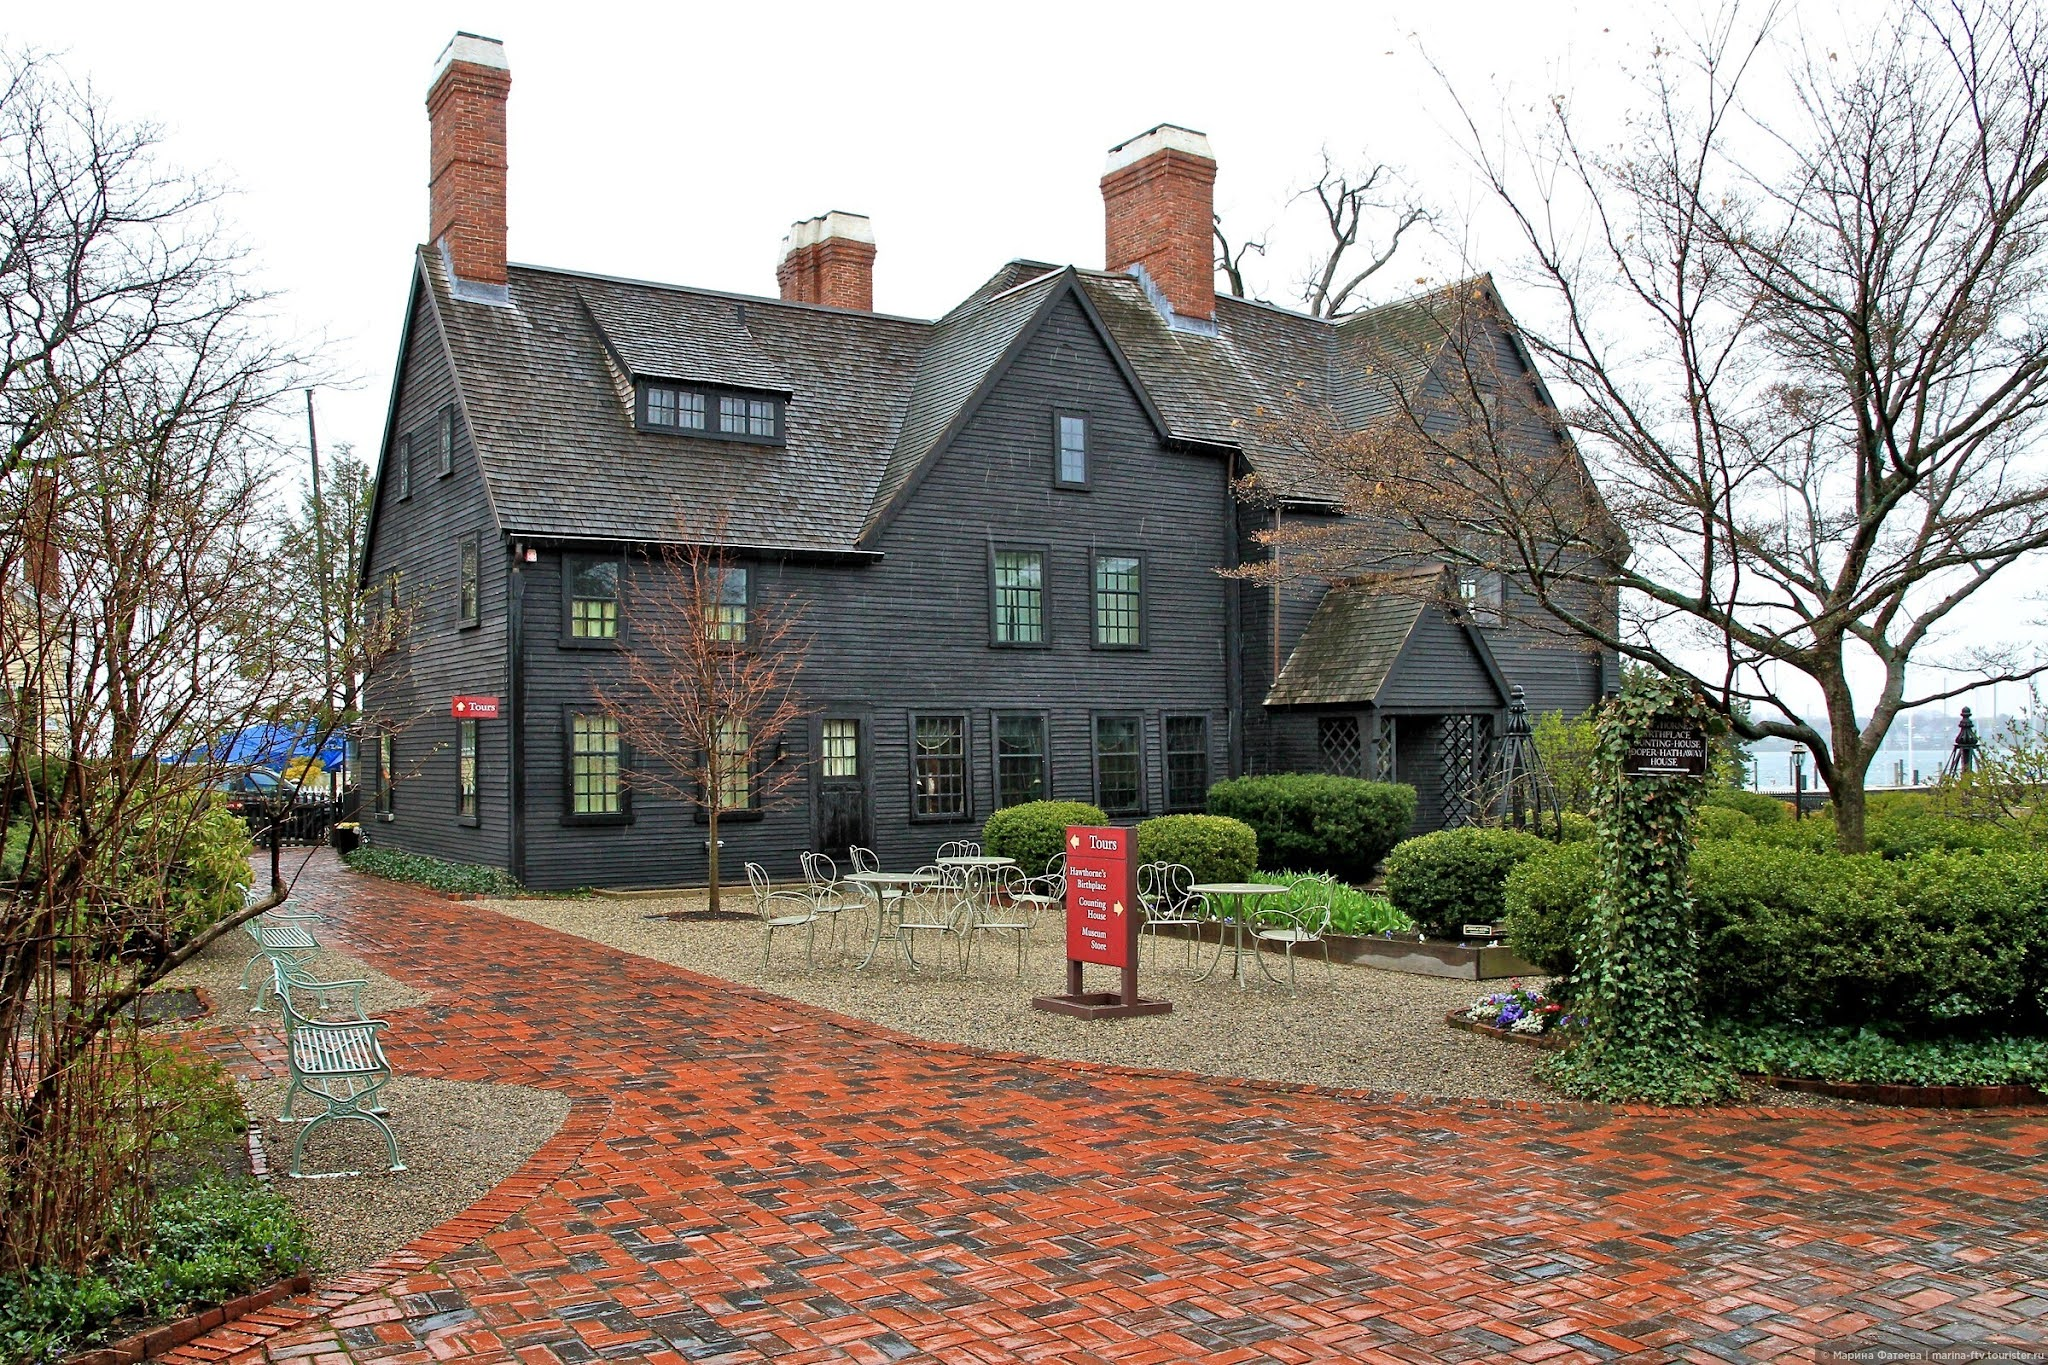 Salem, The capital of witchcraft, Massachusetts